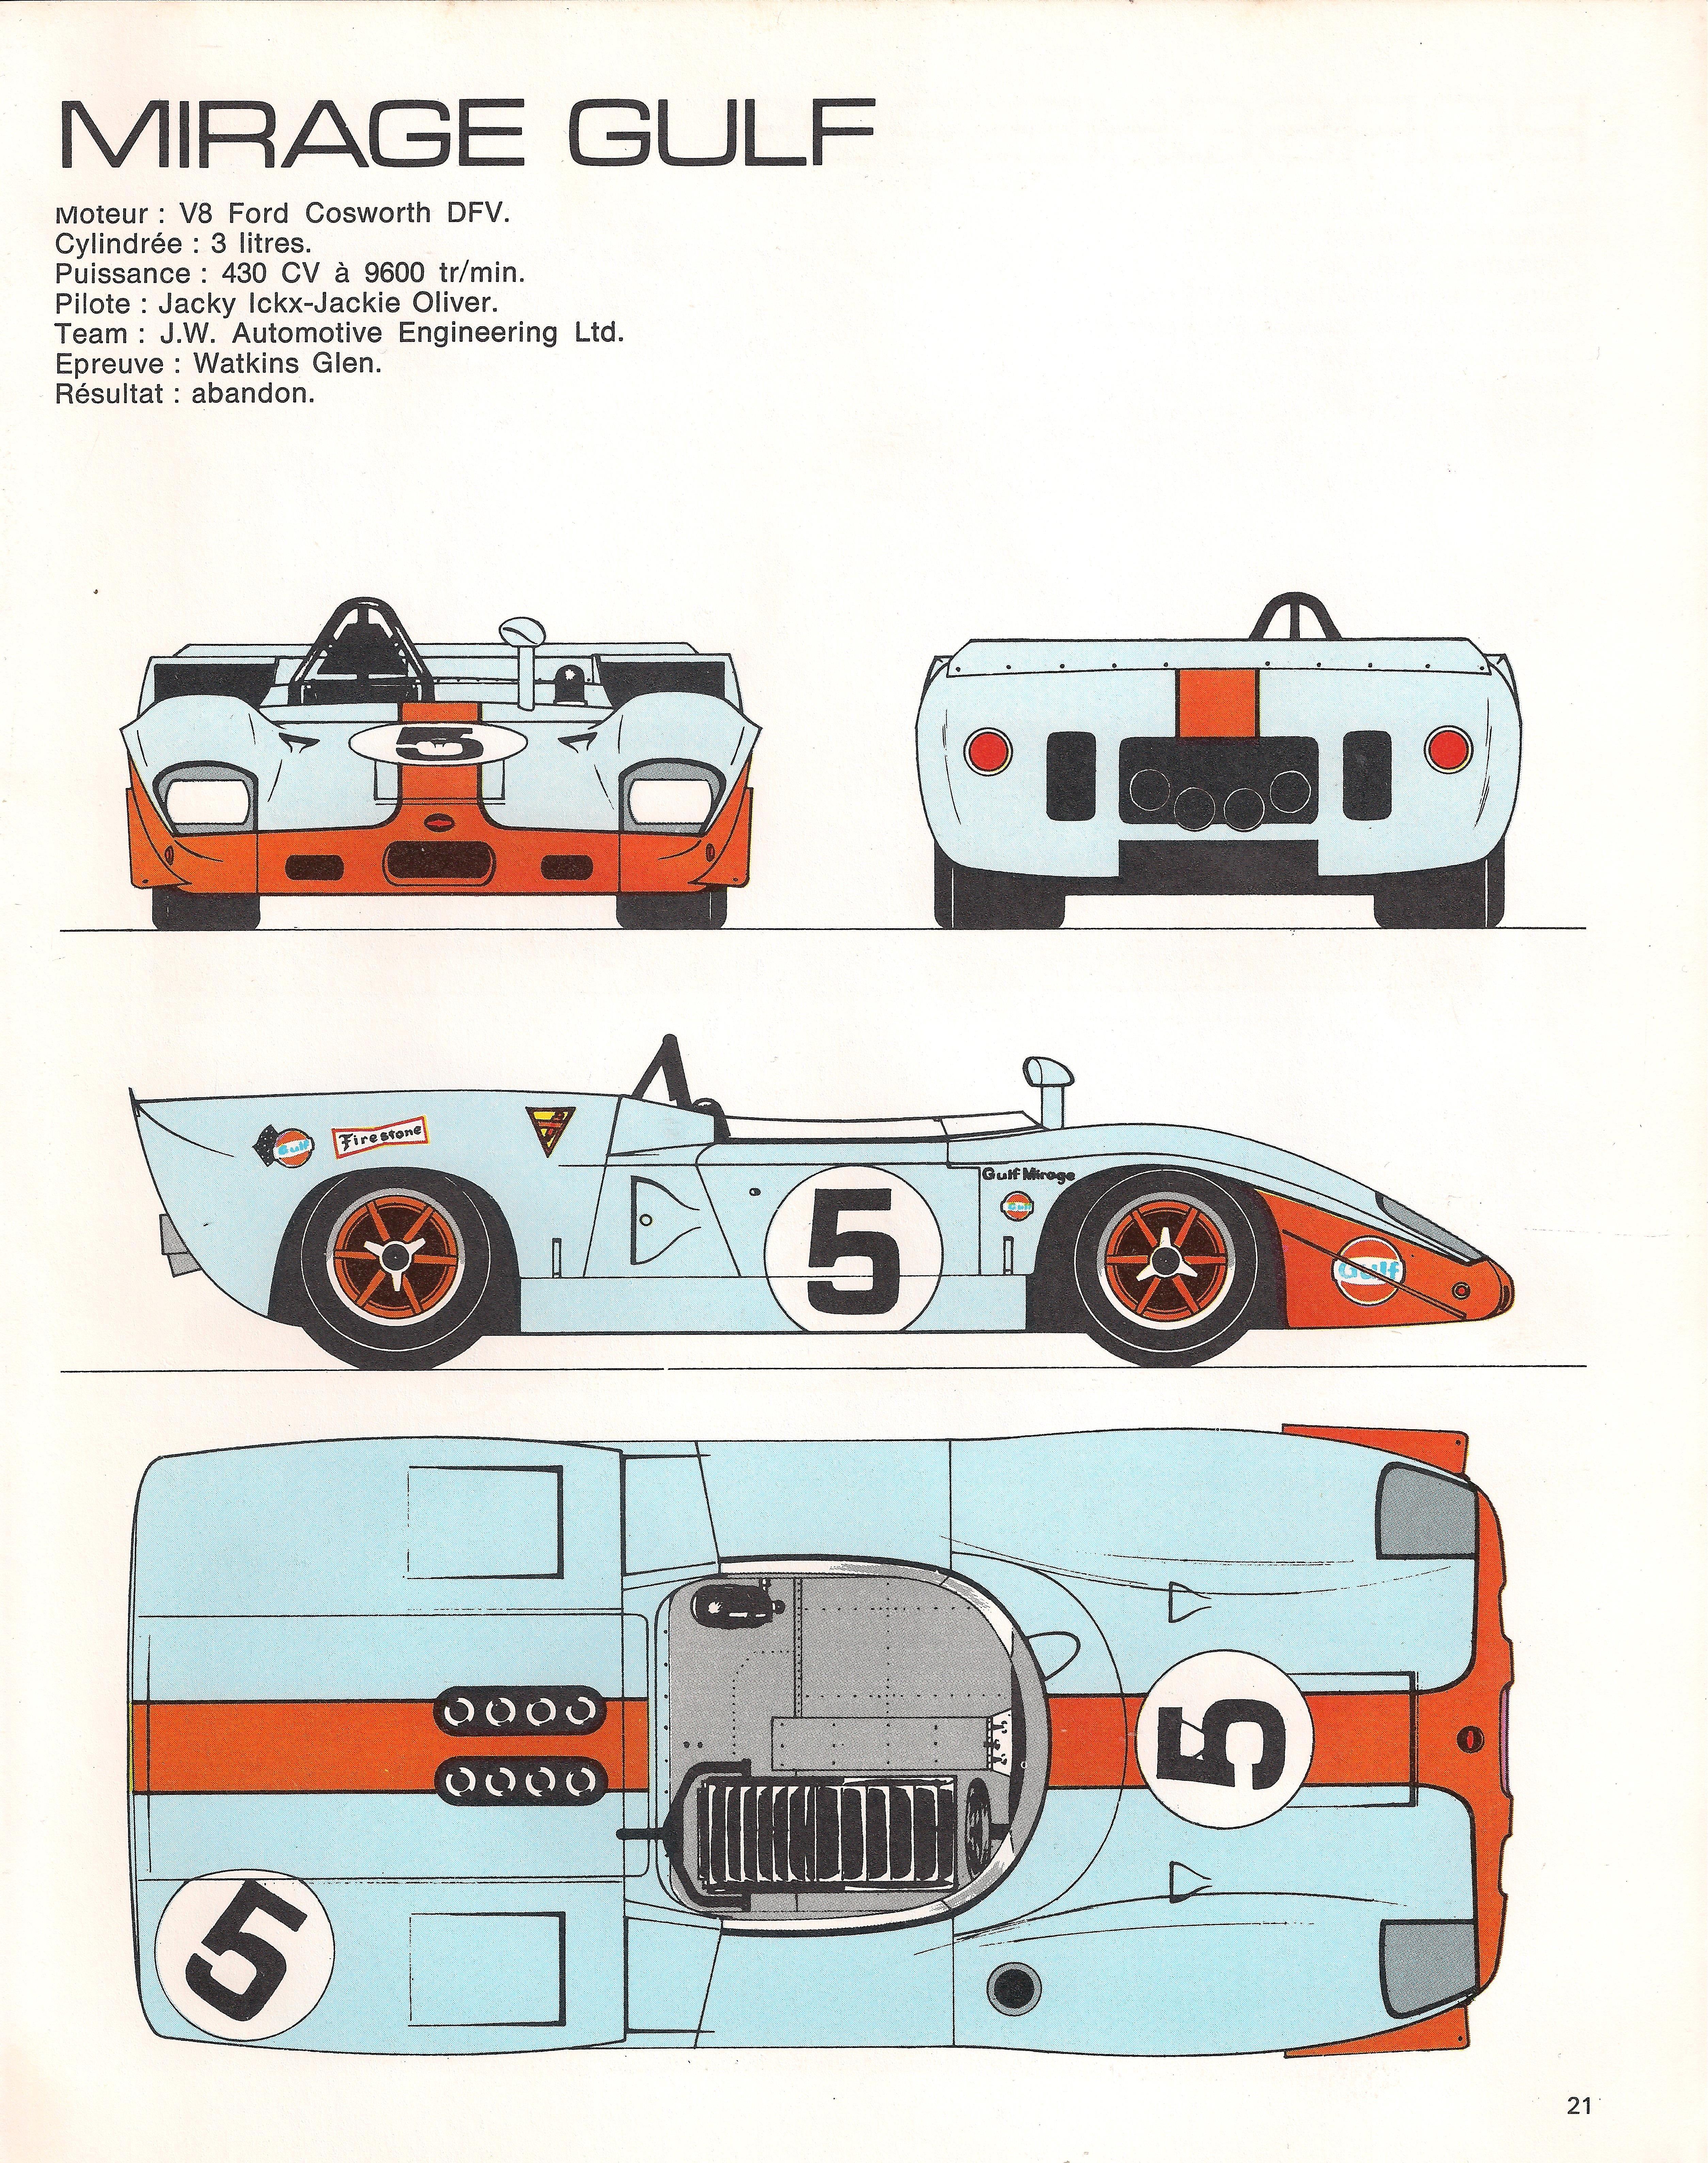 F1 Car Diagram Mirage Gulf M1 1969 Racing Cars In Profile Of F1 Car Diagram